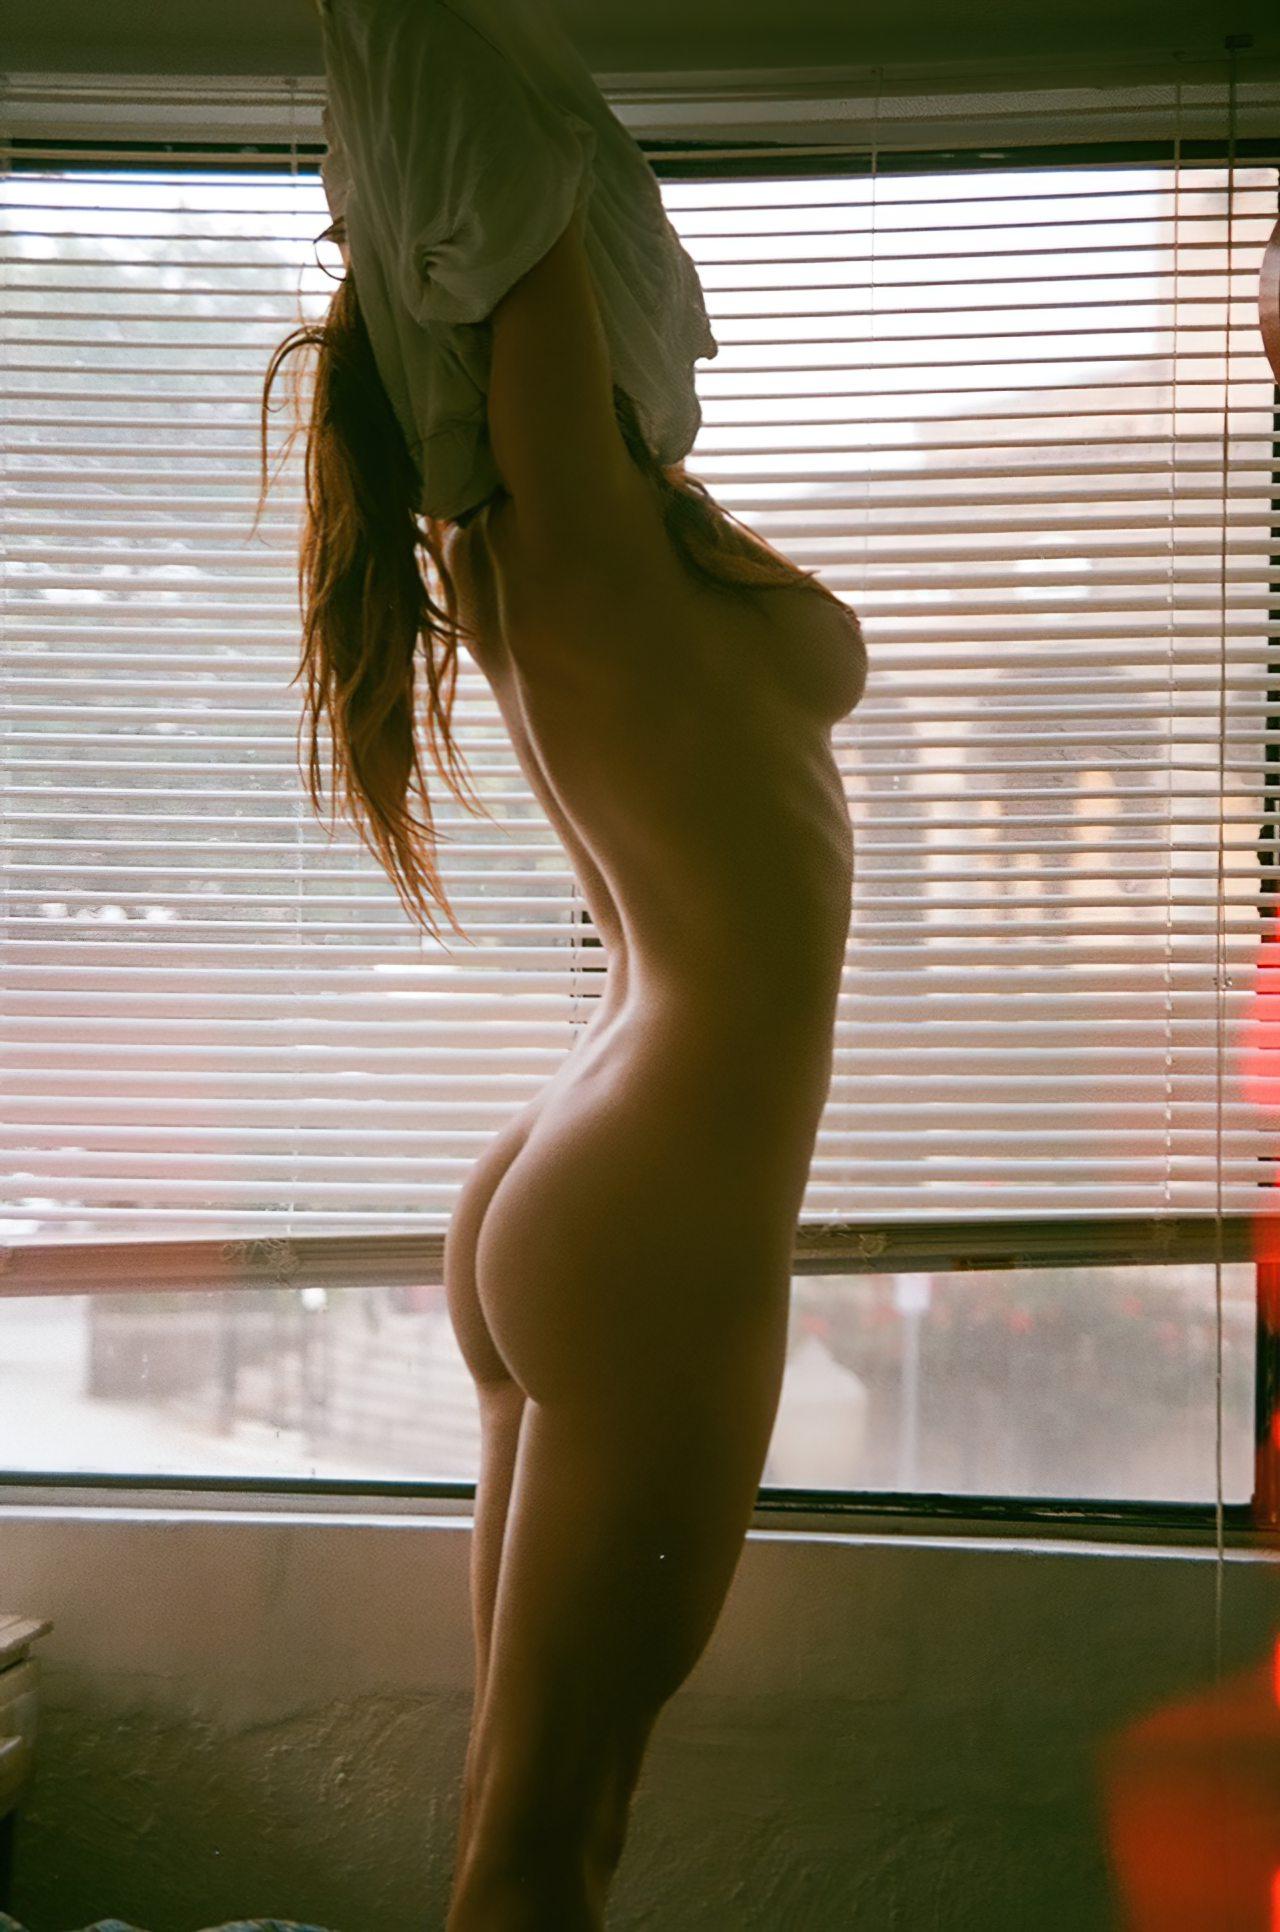 50 Fotos de Mulheres (14)